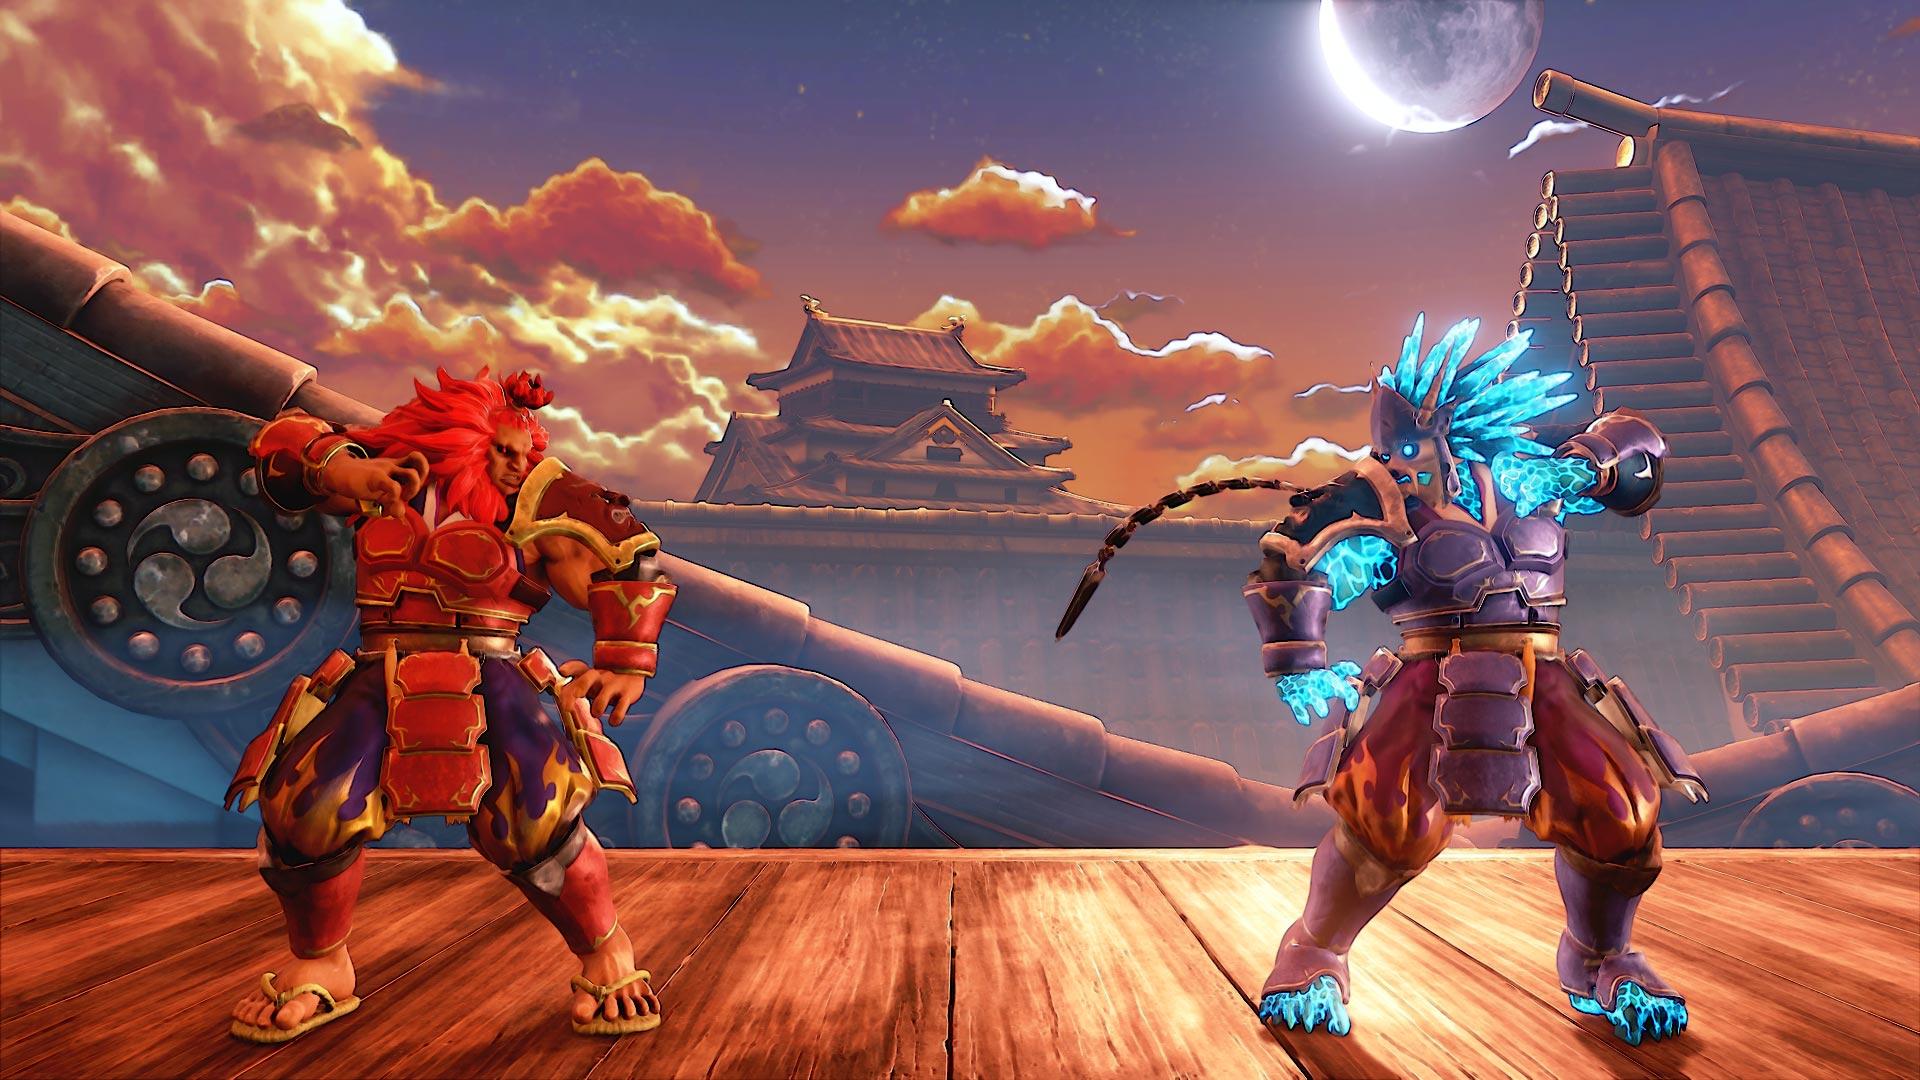 Akuma's Garuda colors 1 out of 5 image gallery